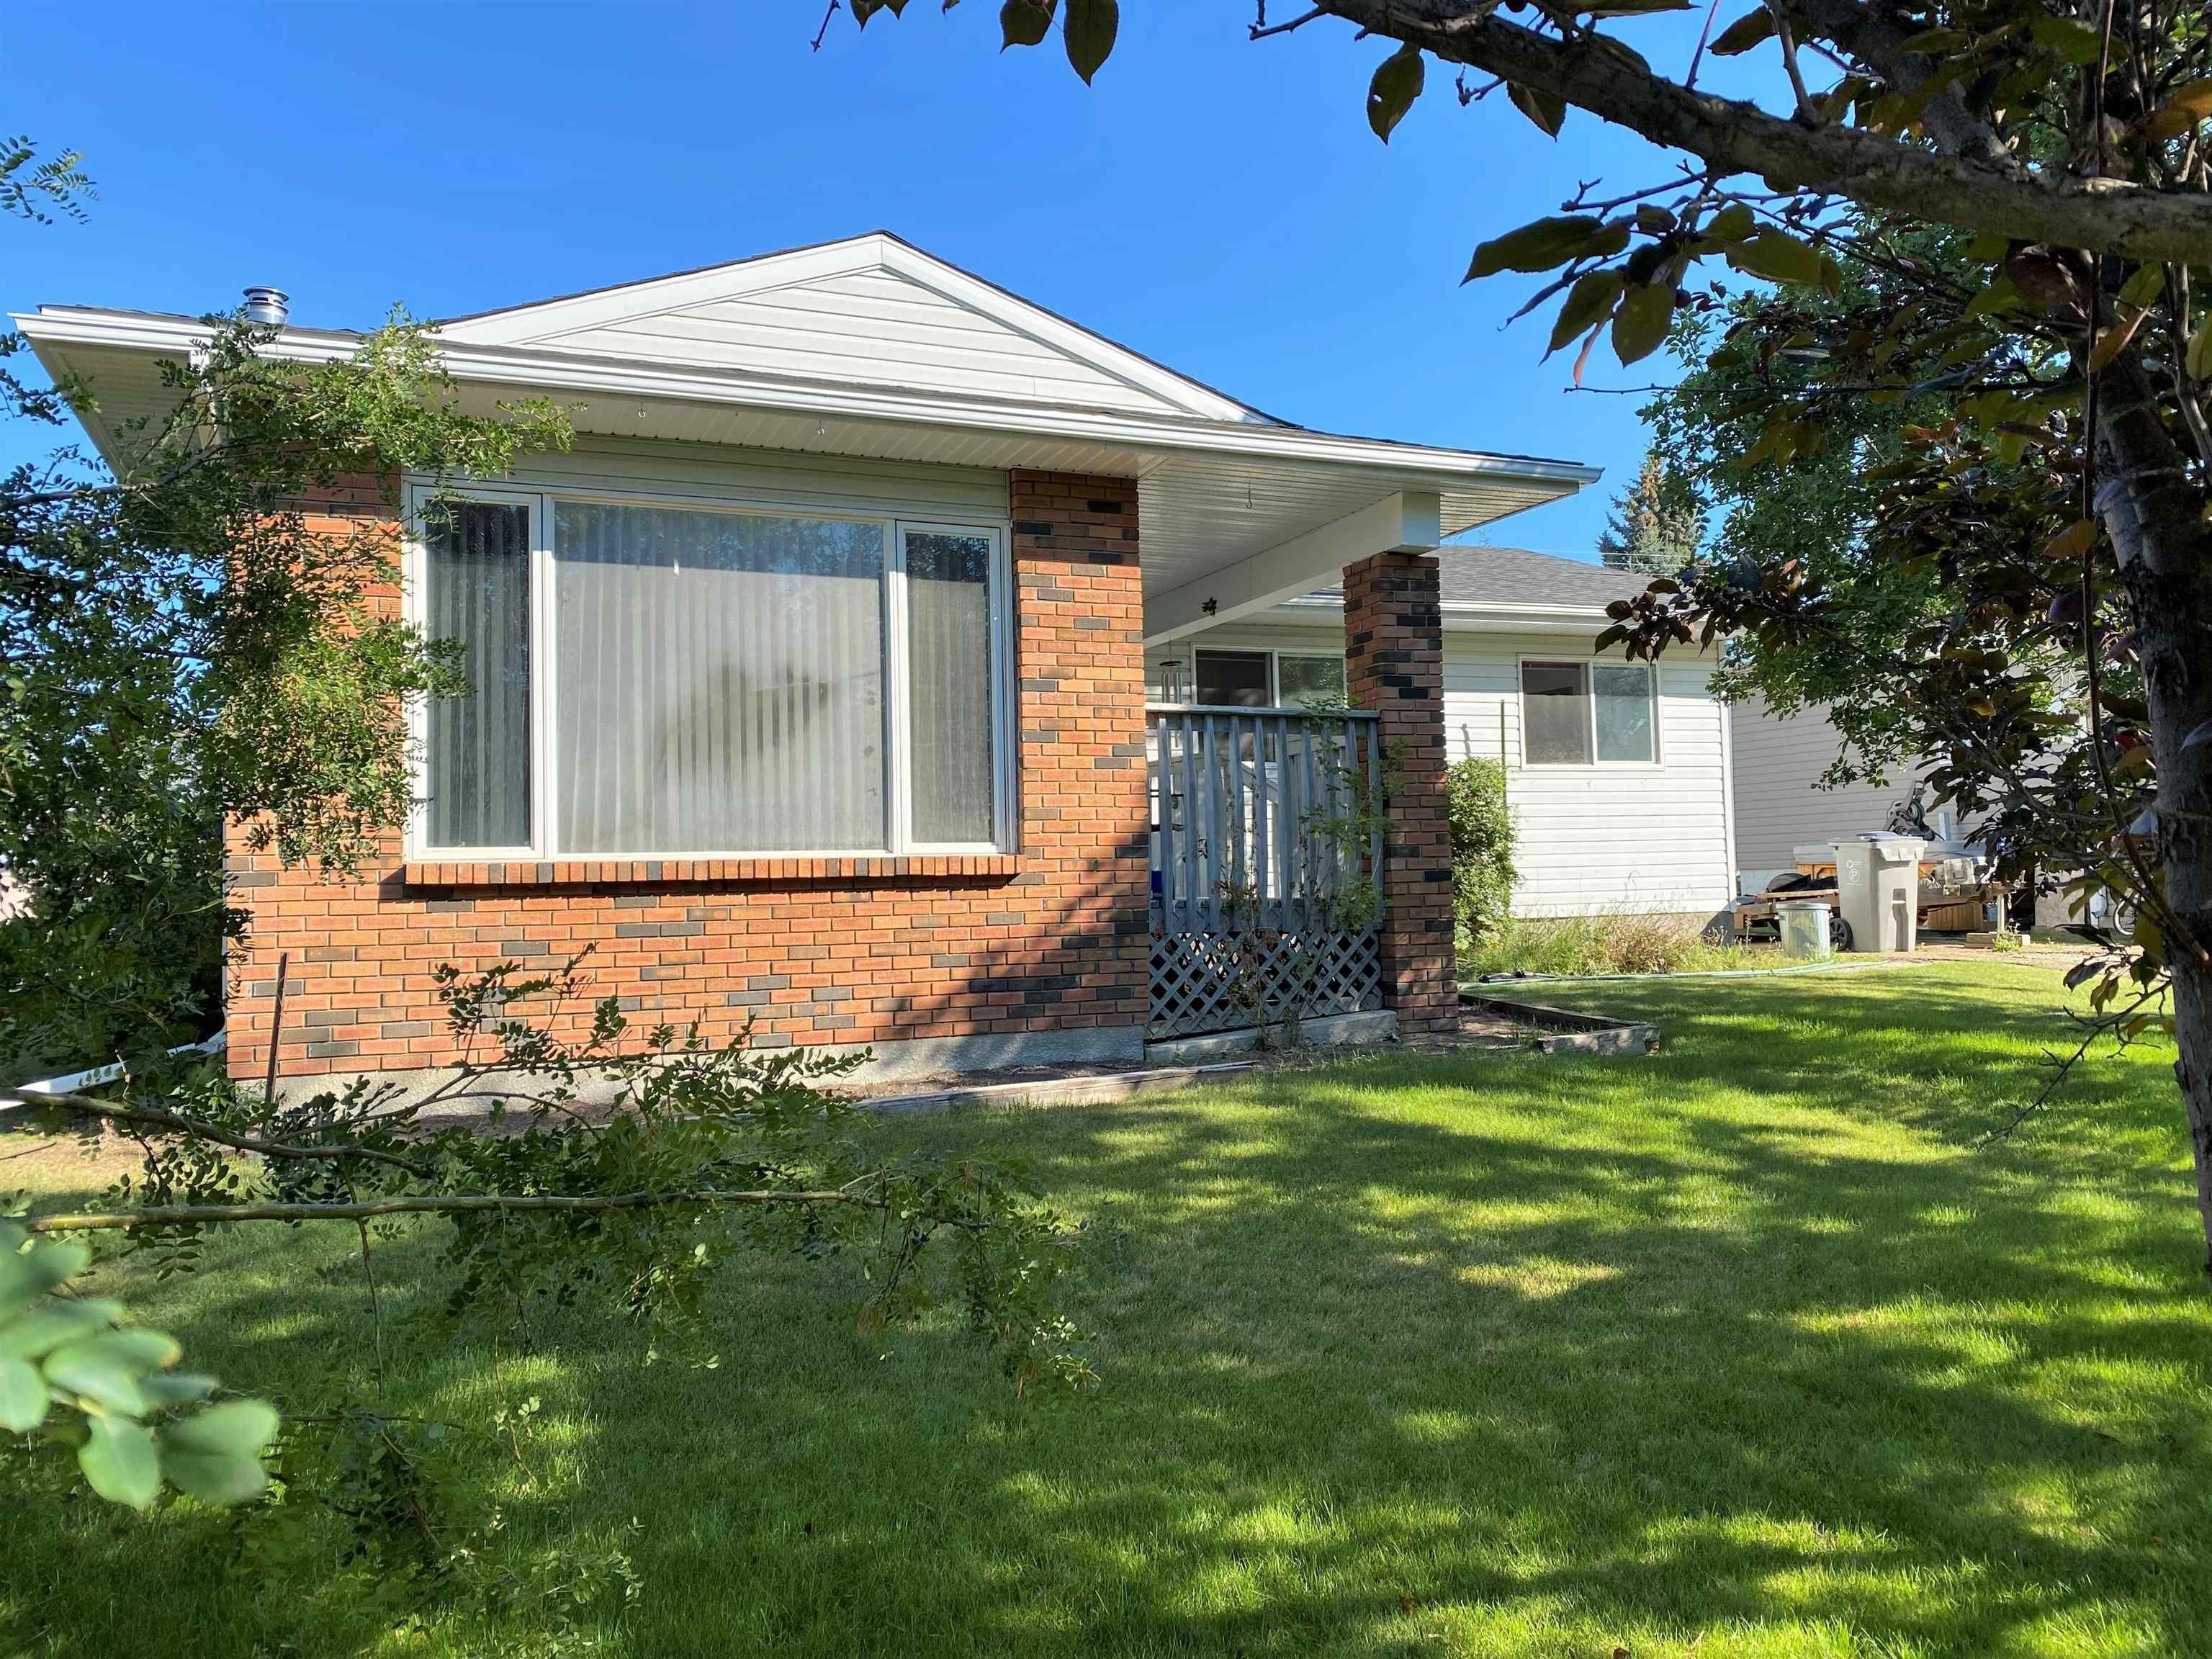 Main Photo: 4924 49 Avenue: Breton House for sale : MLS®# E4258843